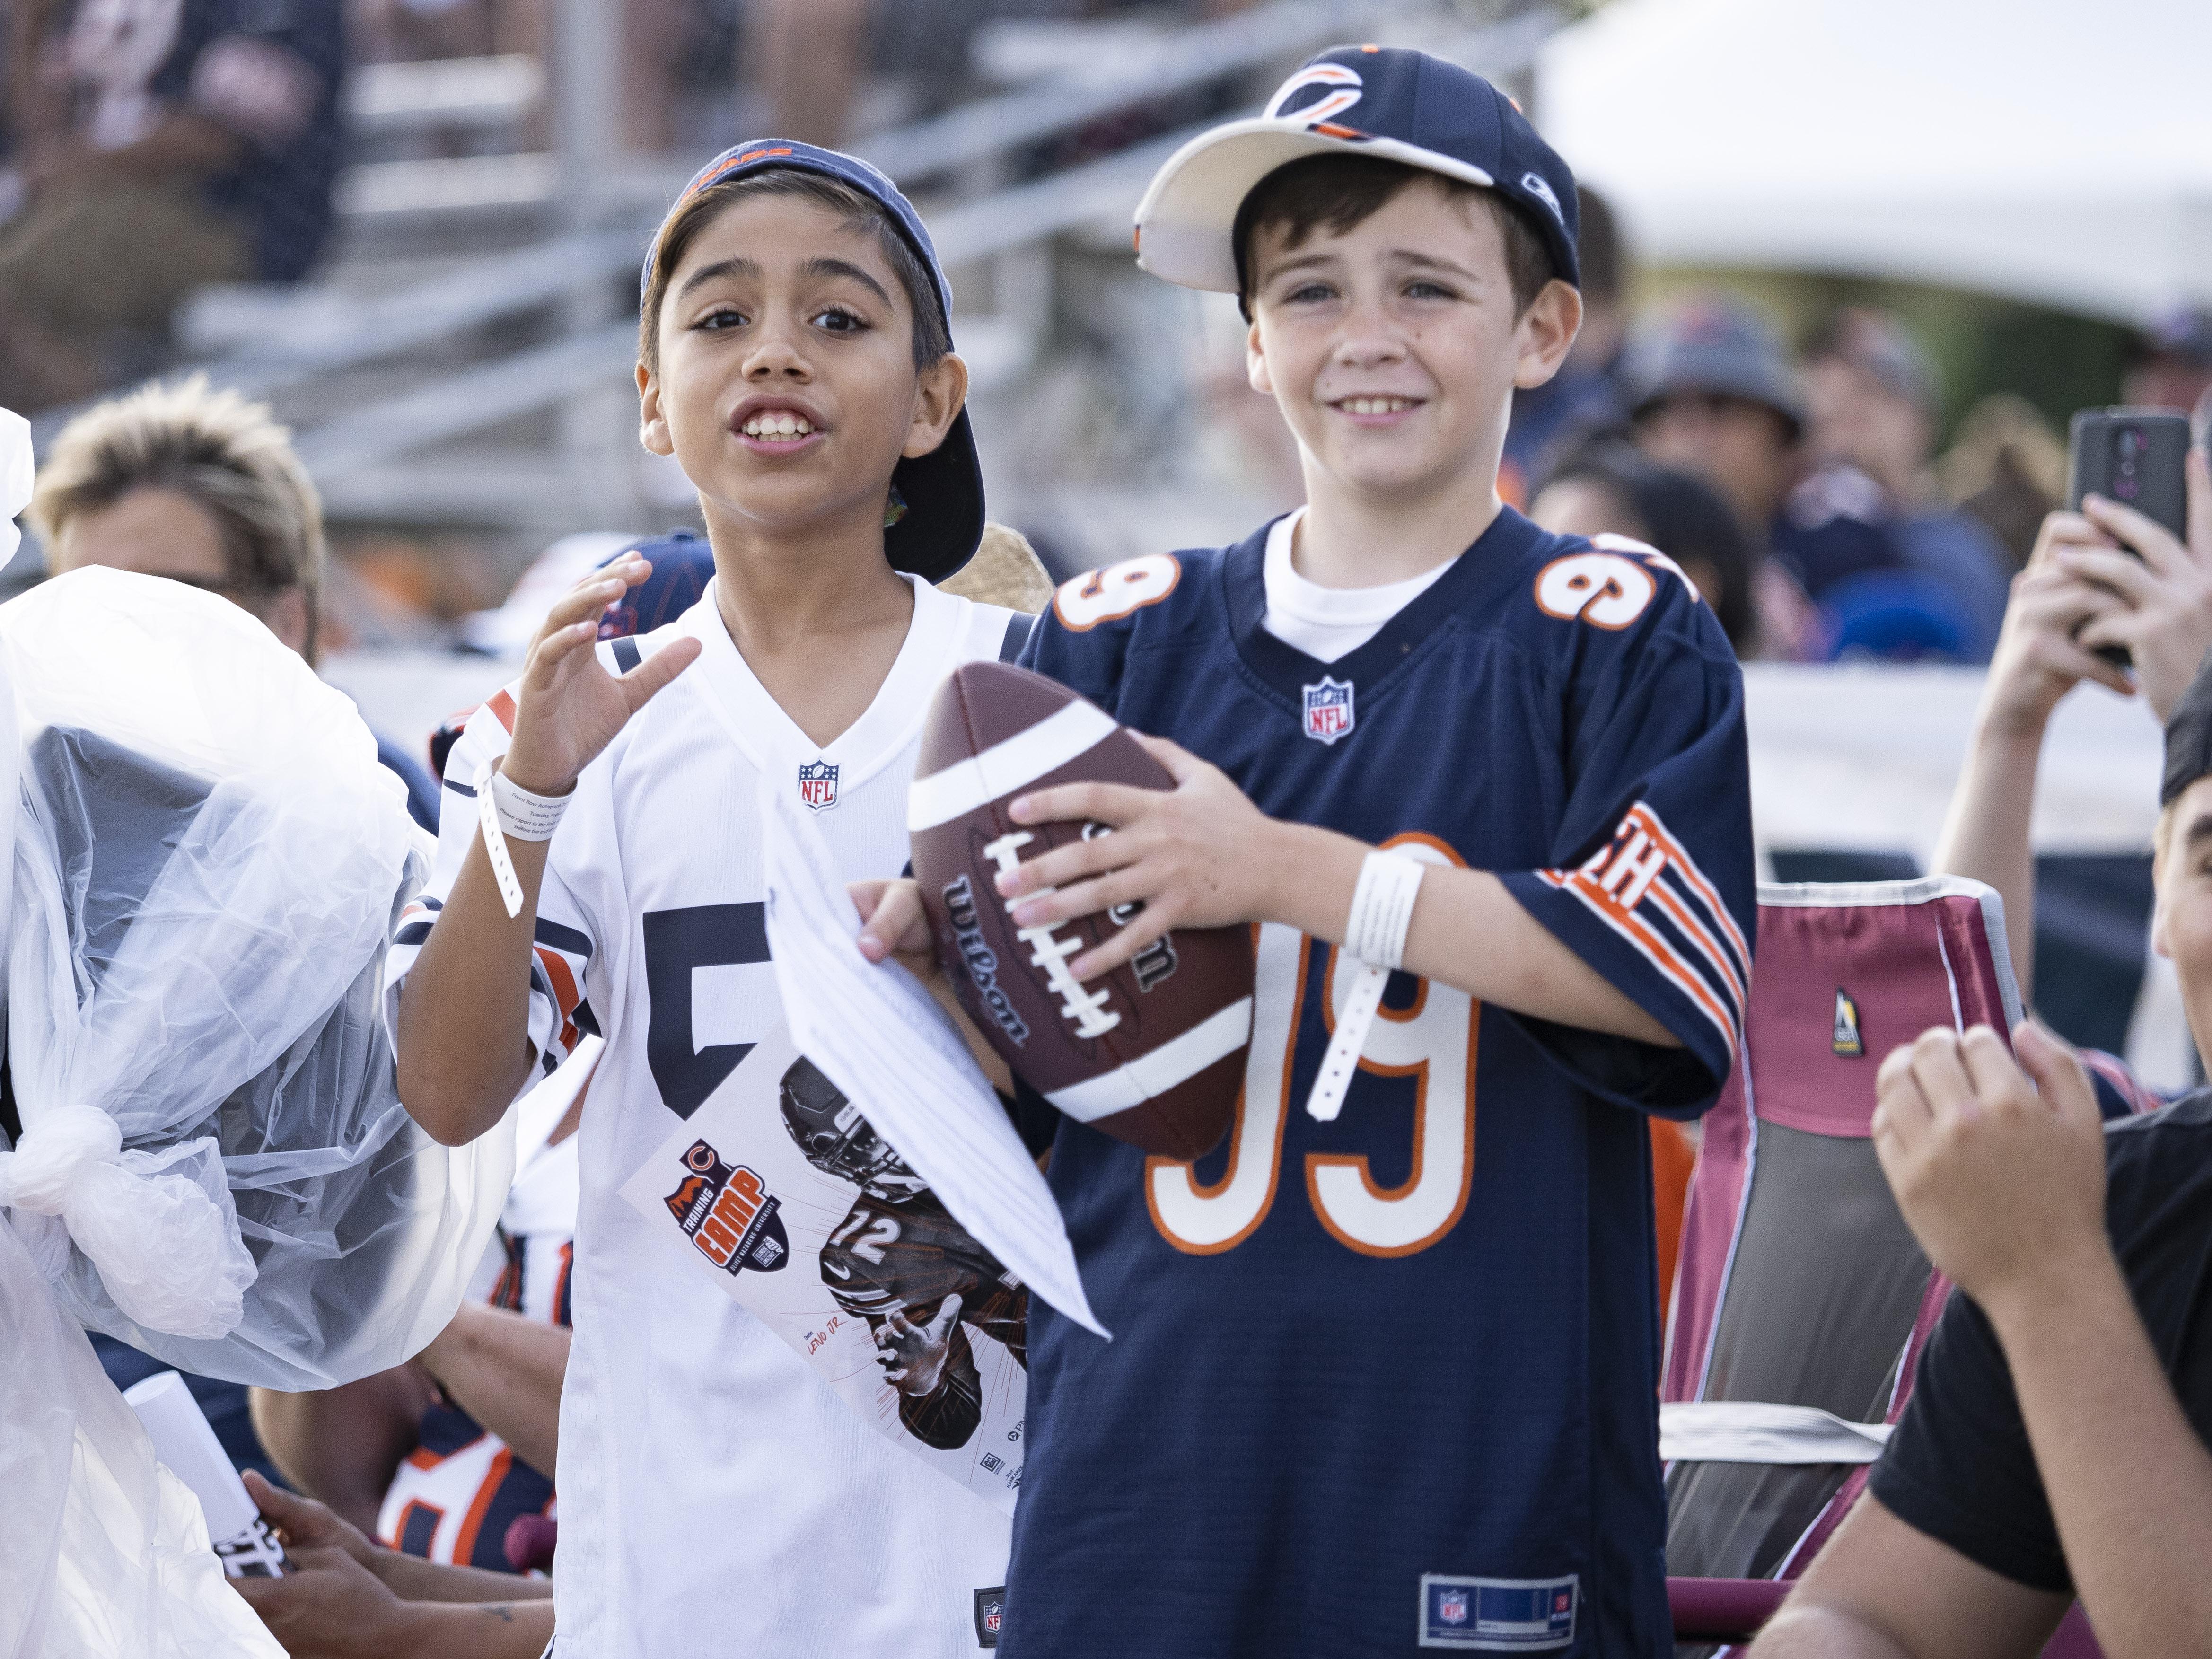 NFL: AUG 06 Bears Training Camp